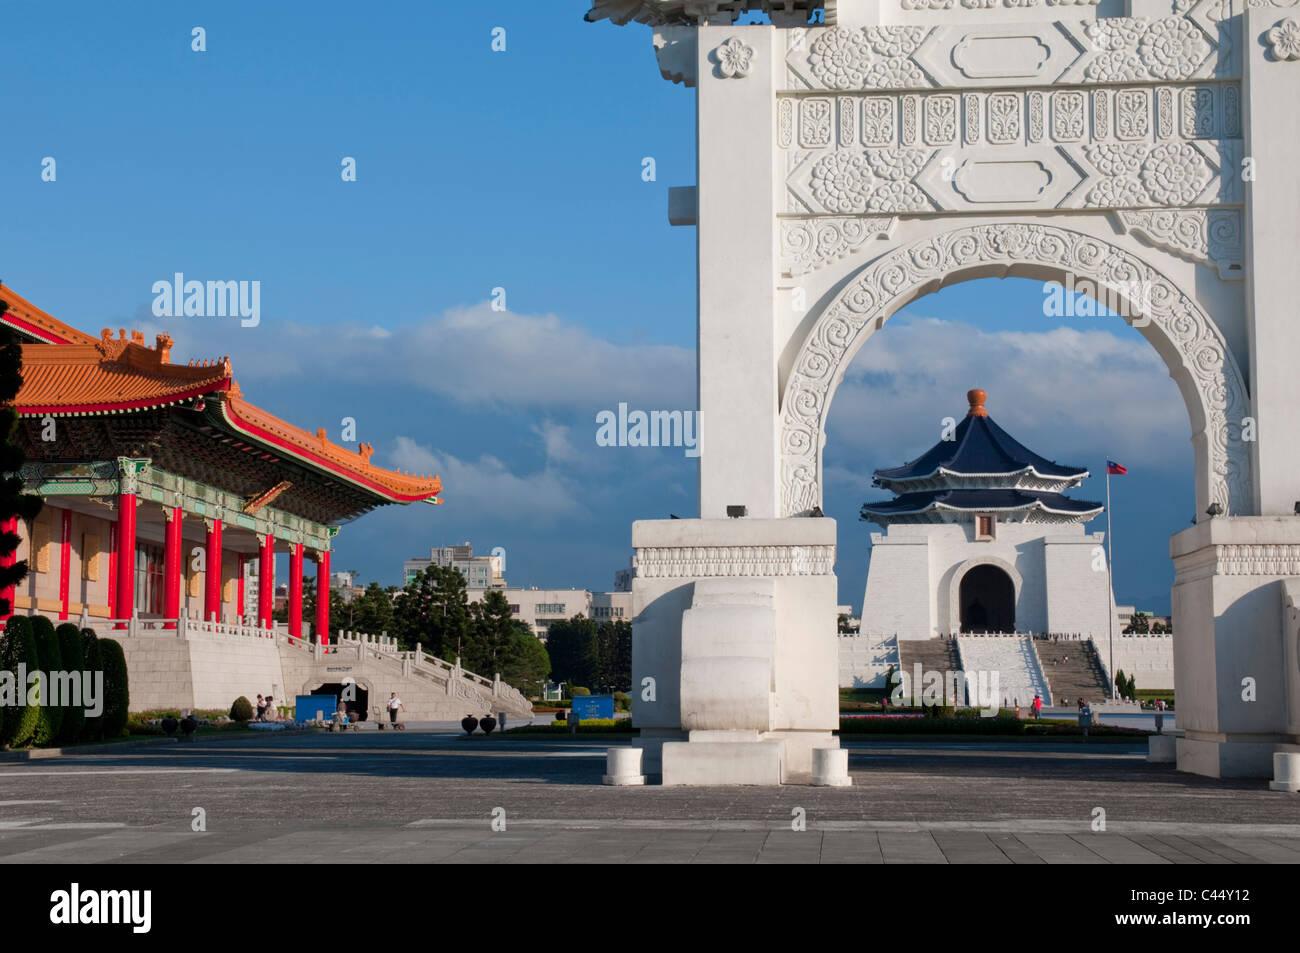 Asia, Taiwan, Taipei, ROC, Cina, città capitale, Chiang Kai Shek memorial, hall, diurno, soleggiato, un punto Immagini Stock